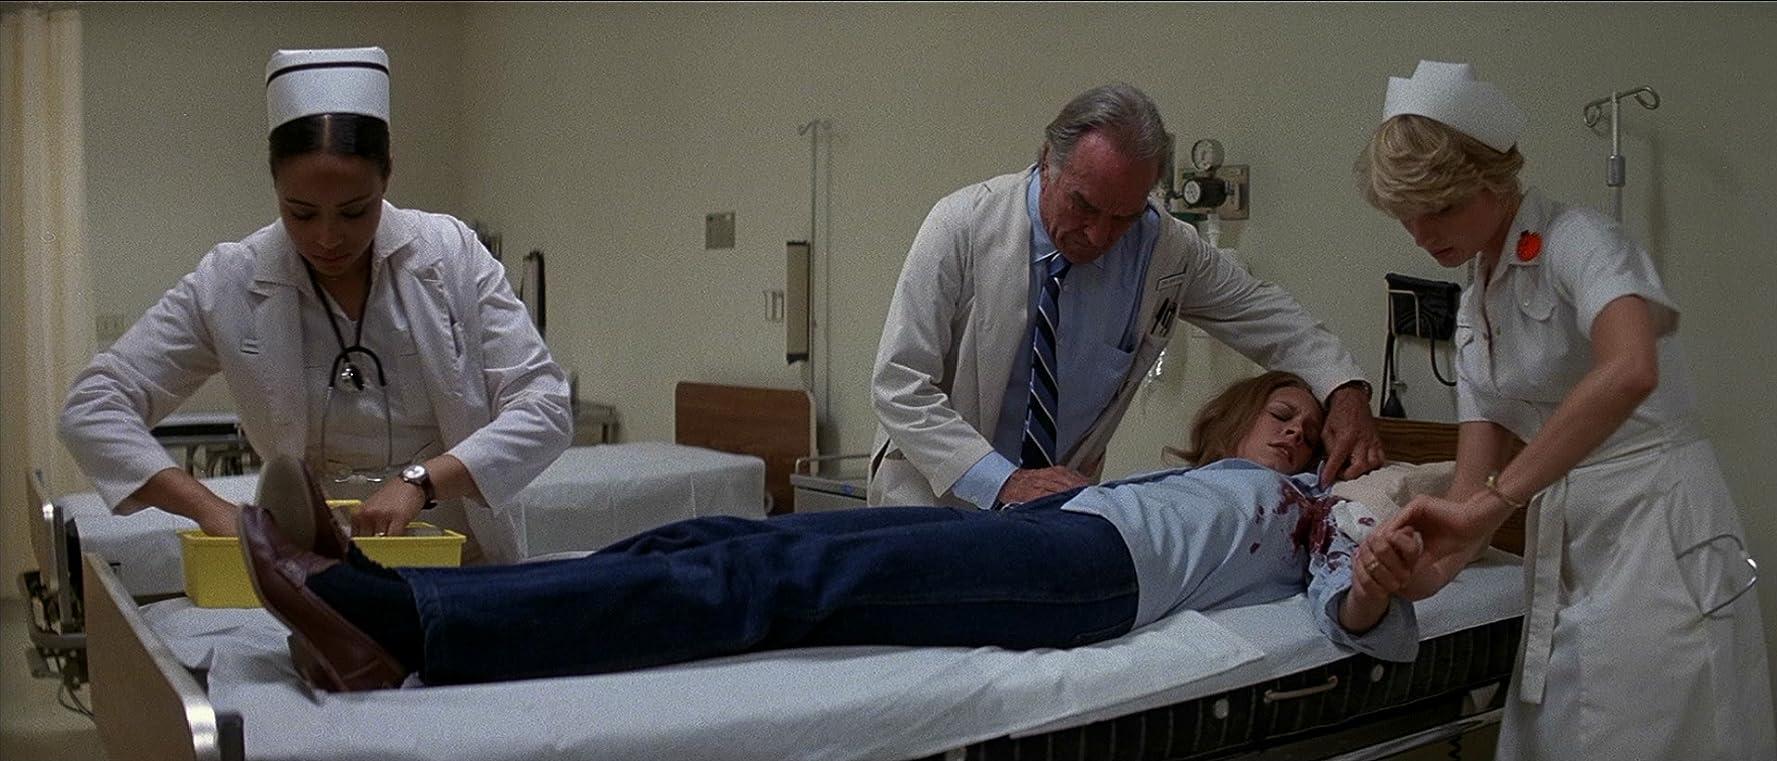 Jamie Lee Curtis, Gloria Gifford, Tawny Moyer, and Ford Rainey in Halloween II (1981)